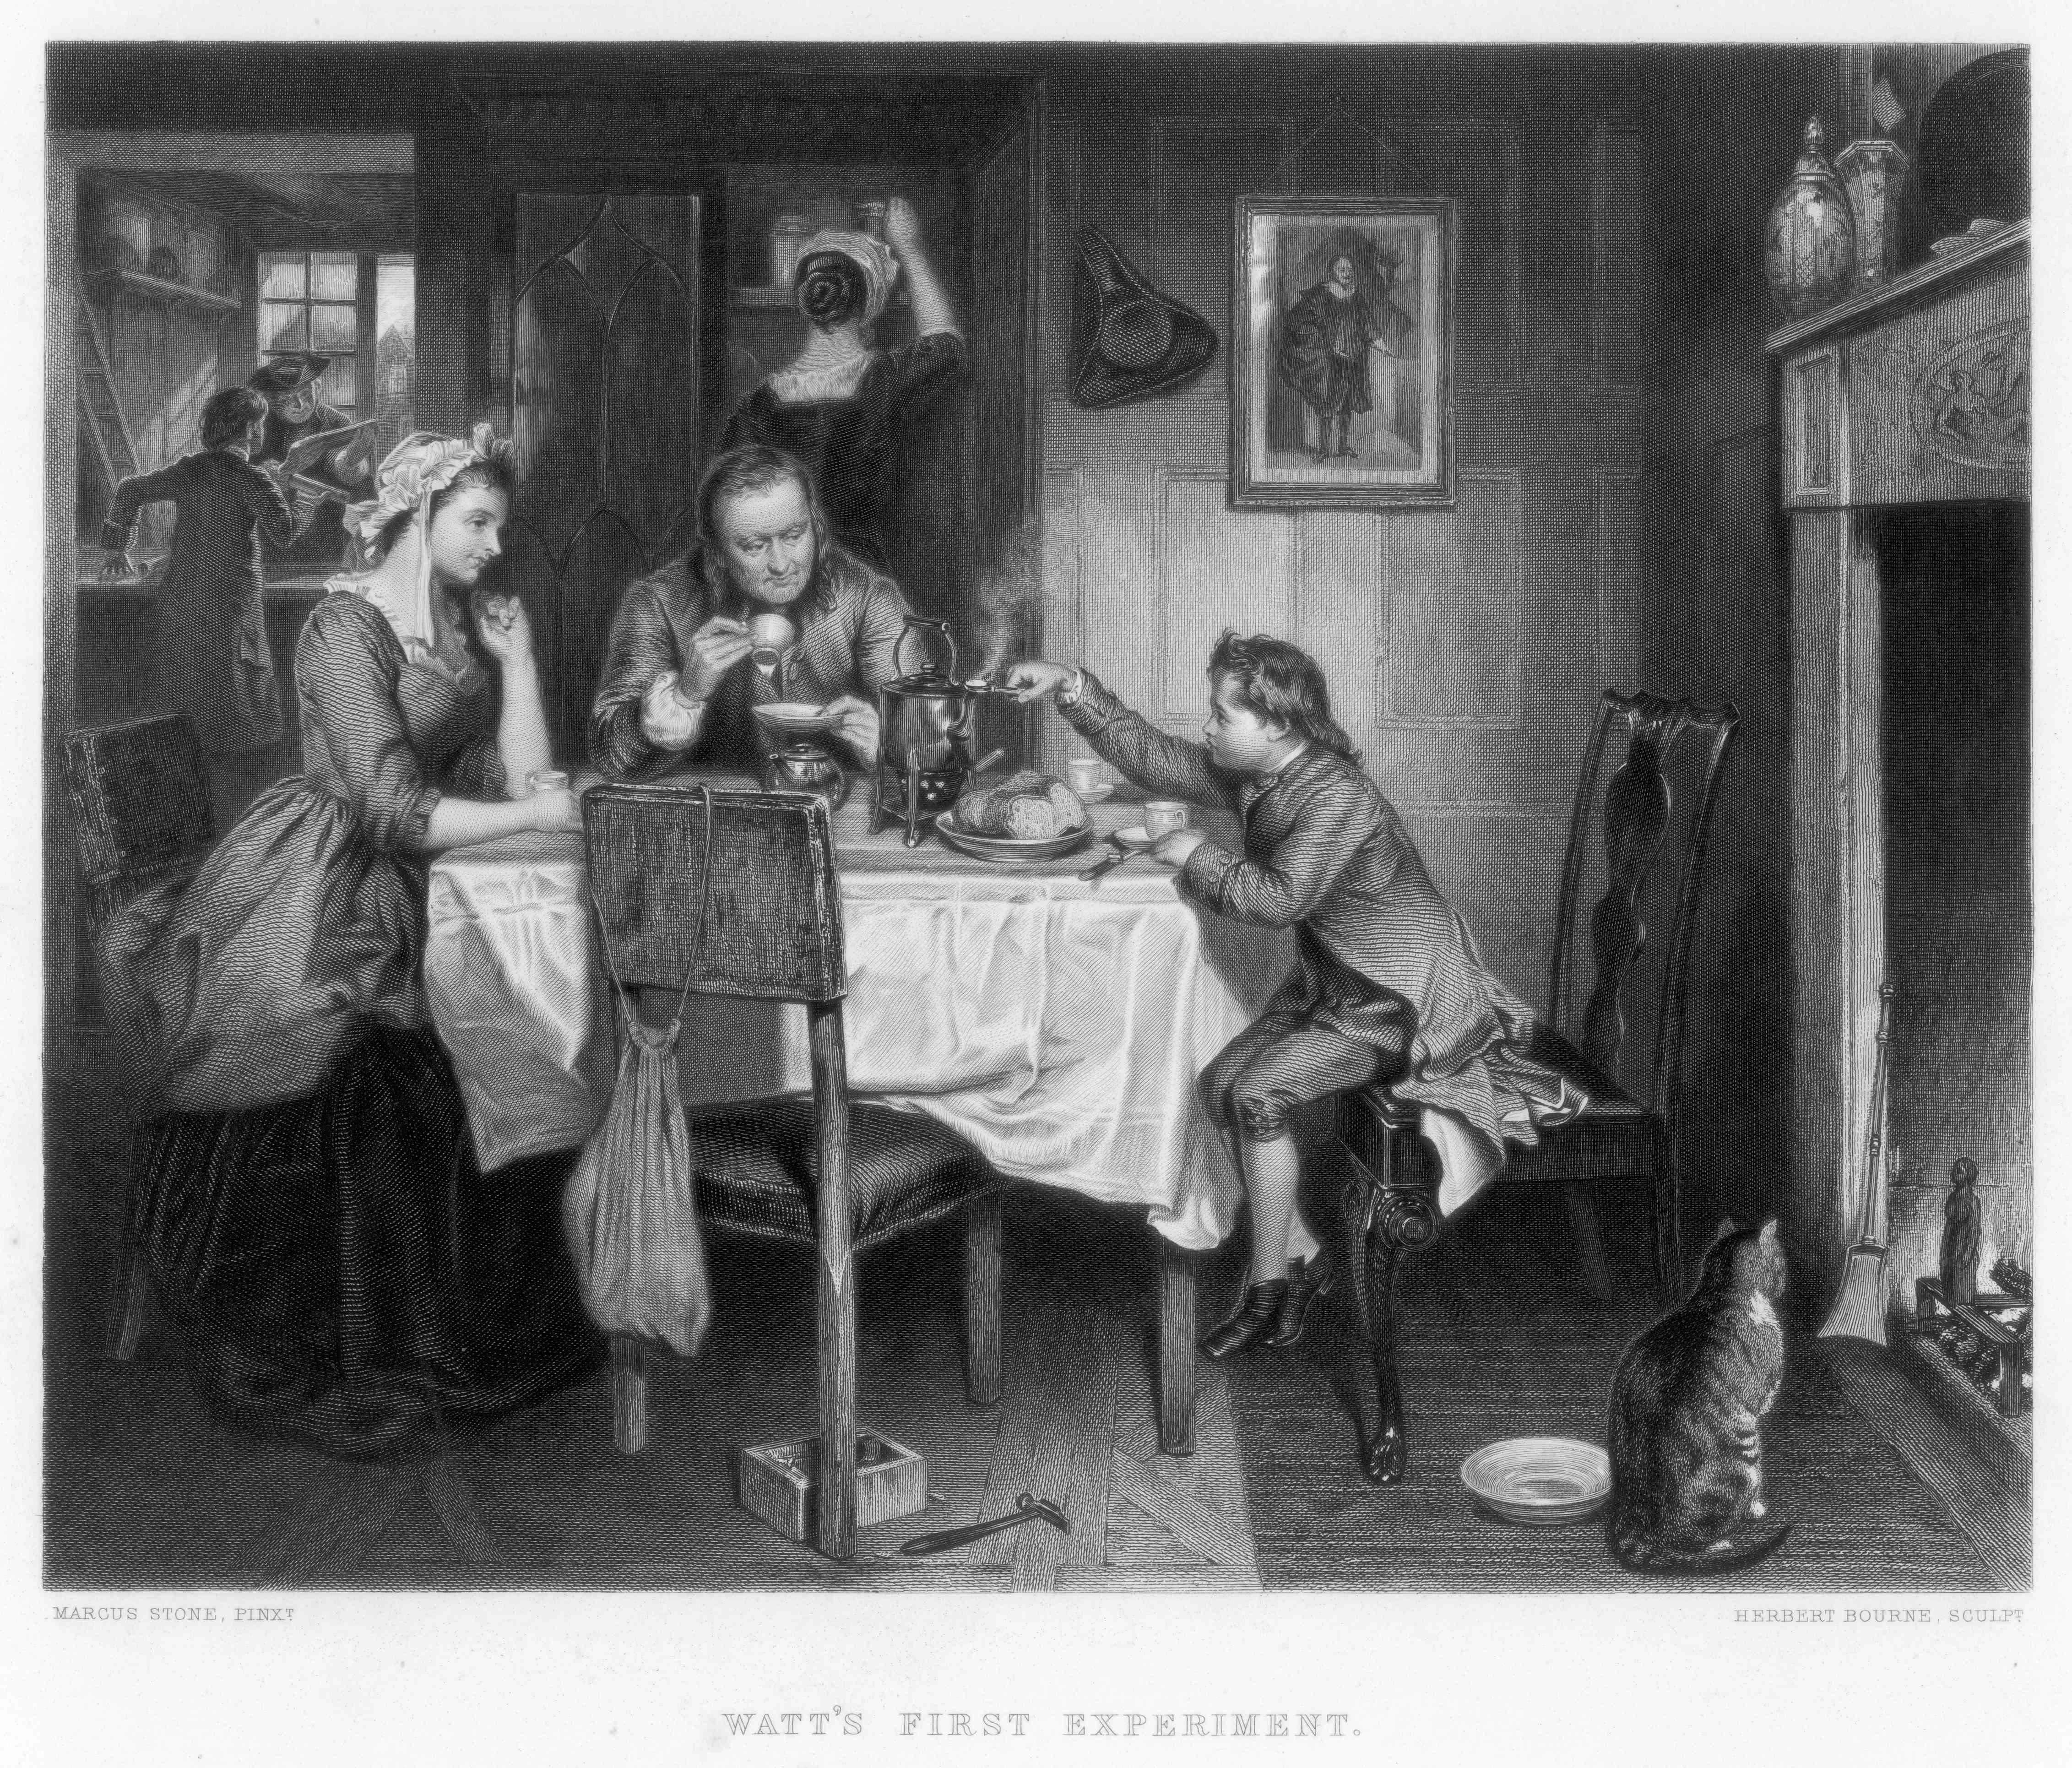 'Watt's First Experiment', 18th century, (c1870). Artist: Herbert Bourne